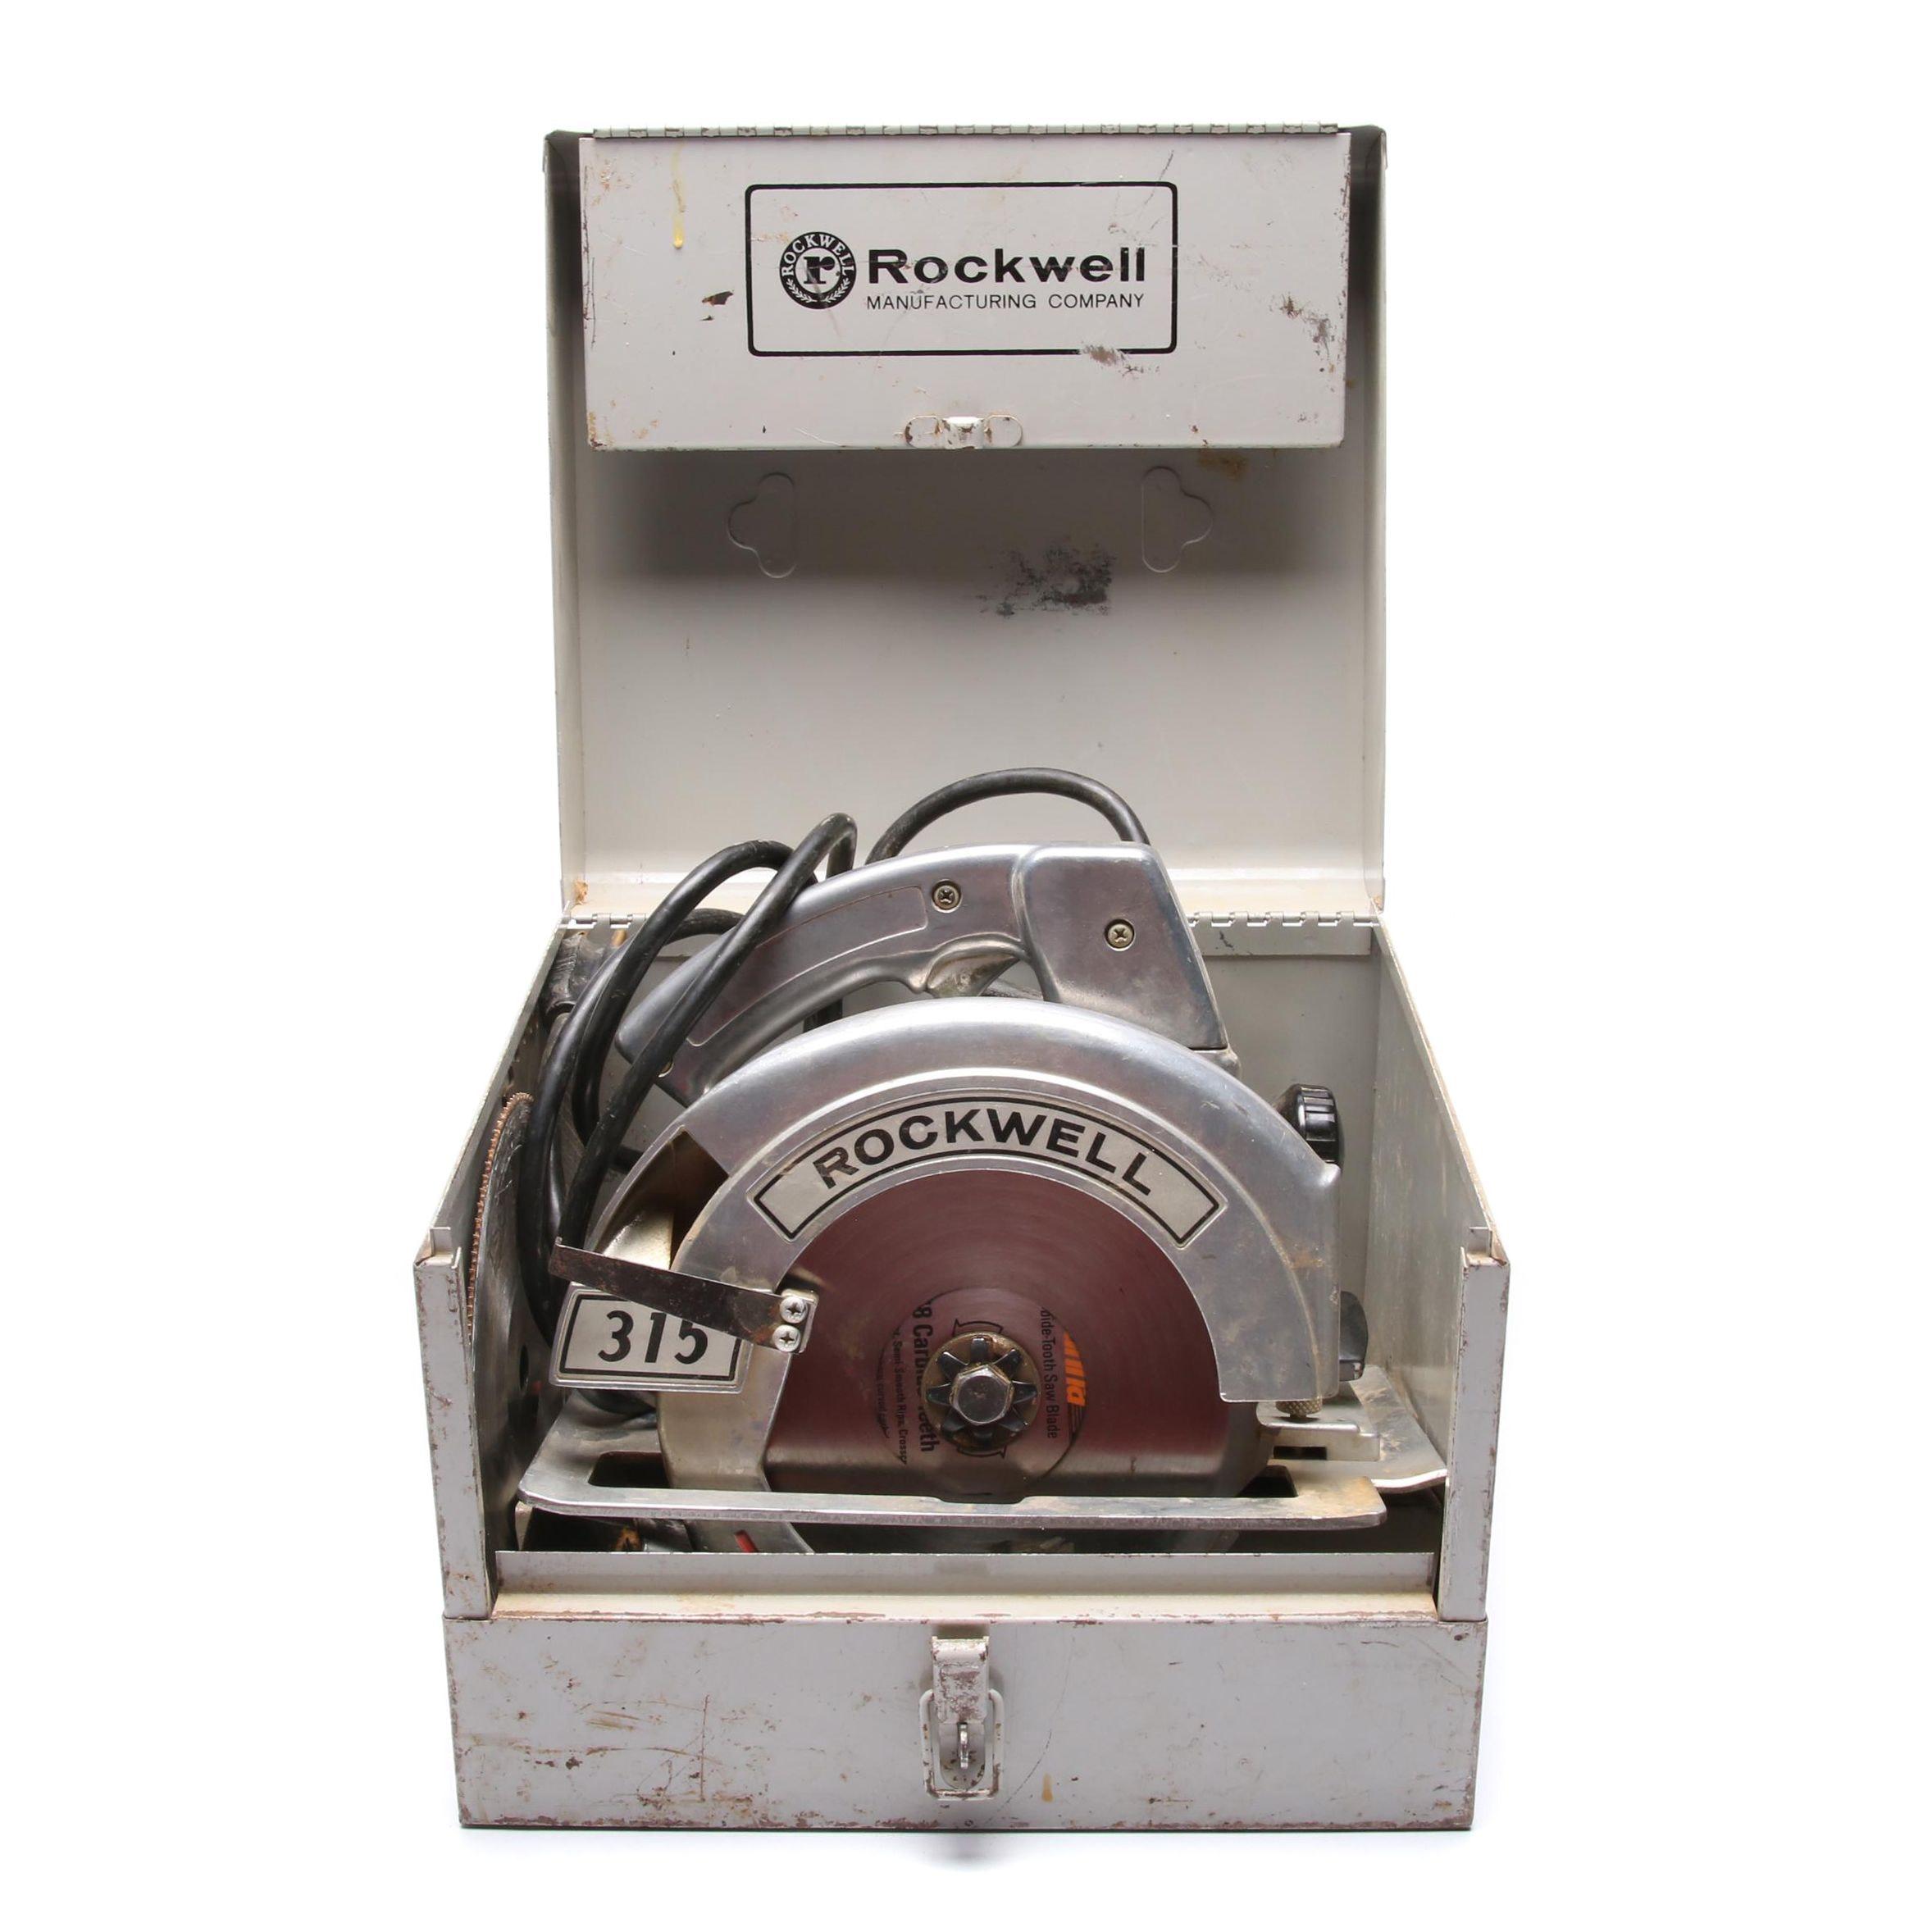 "Vintage Rockwell 7 1/4"" Circular Saw"